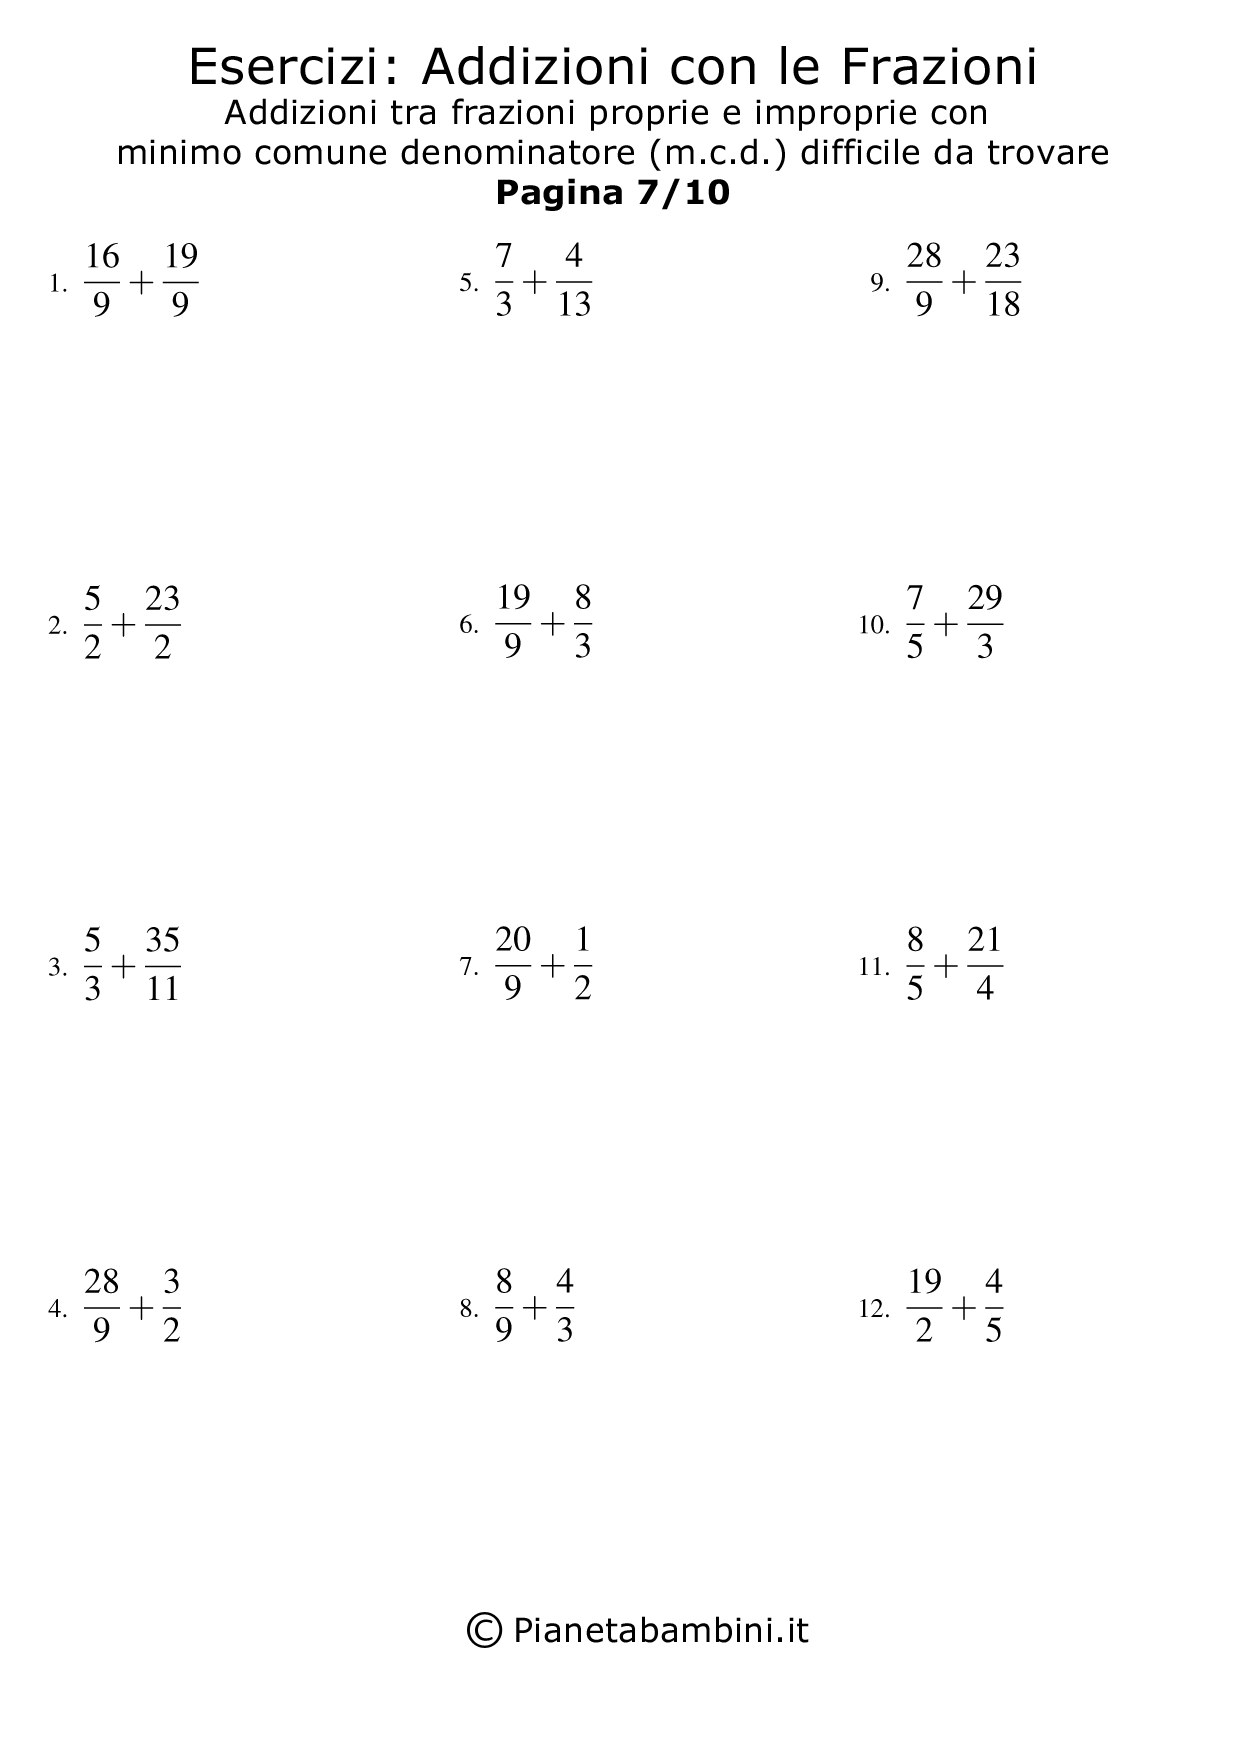 Frazioni-Proprie-Improprie-m.c.d-difficile_07